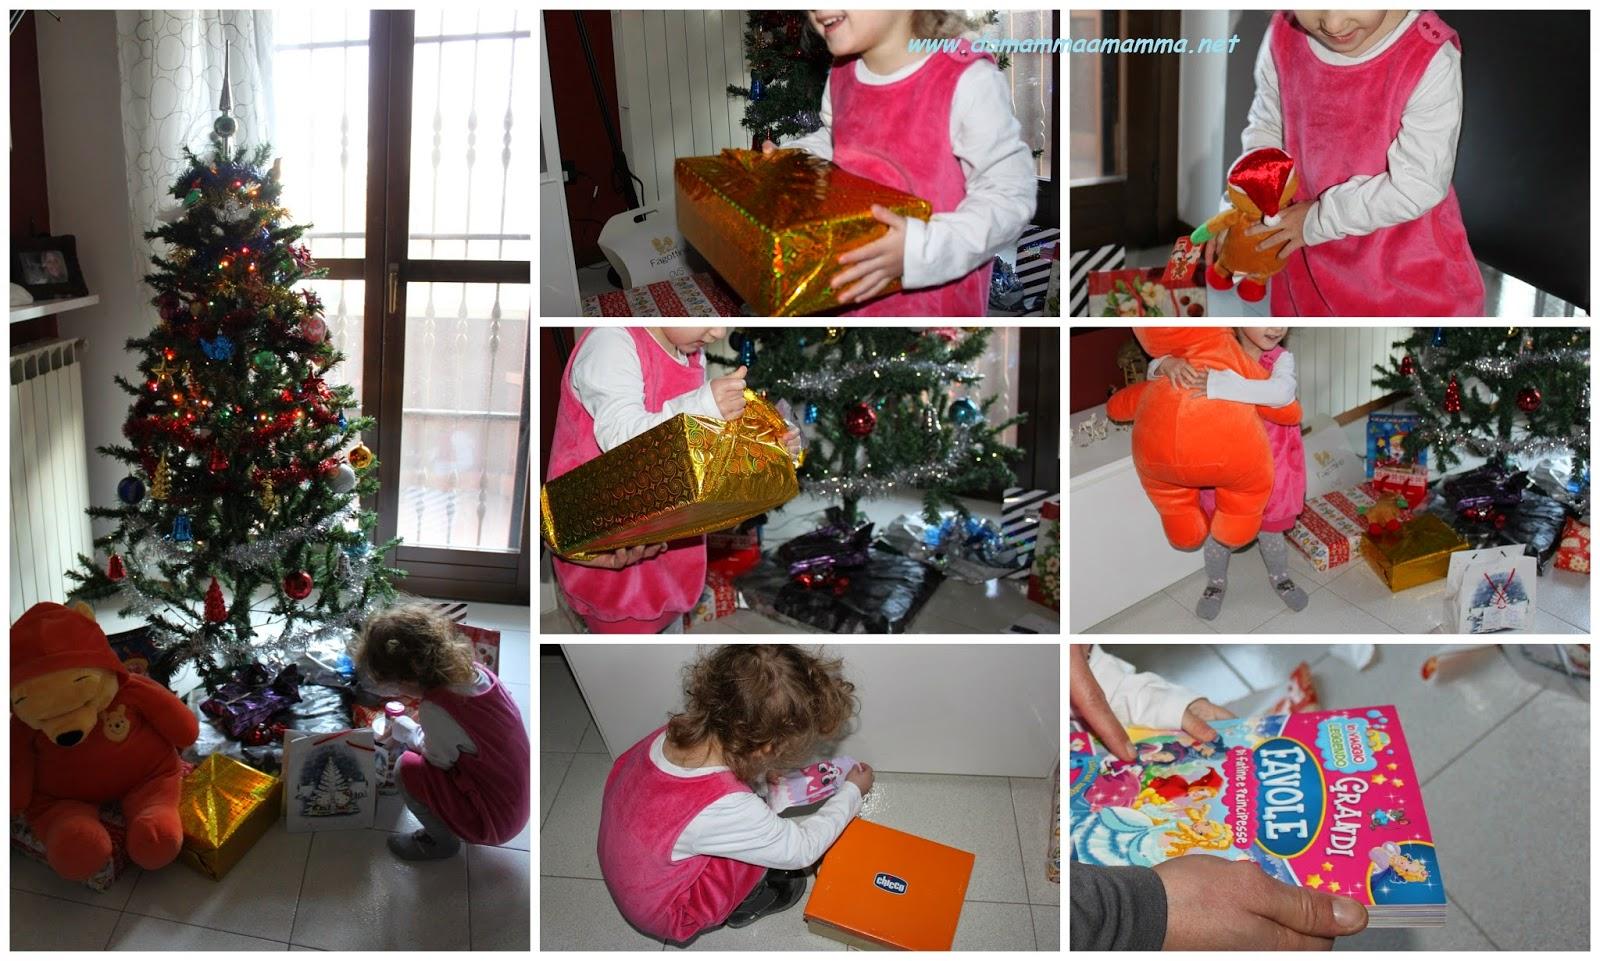 regali-di-natale-2014